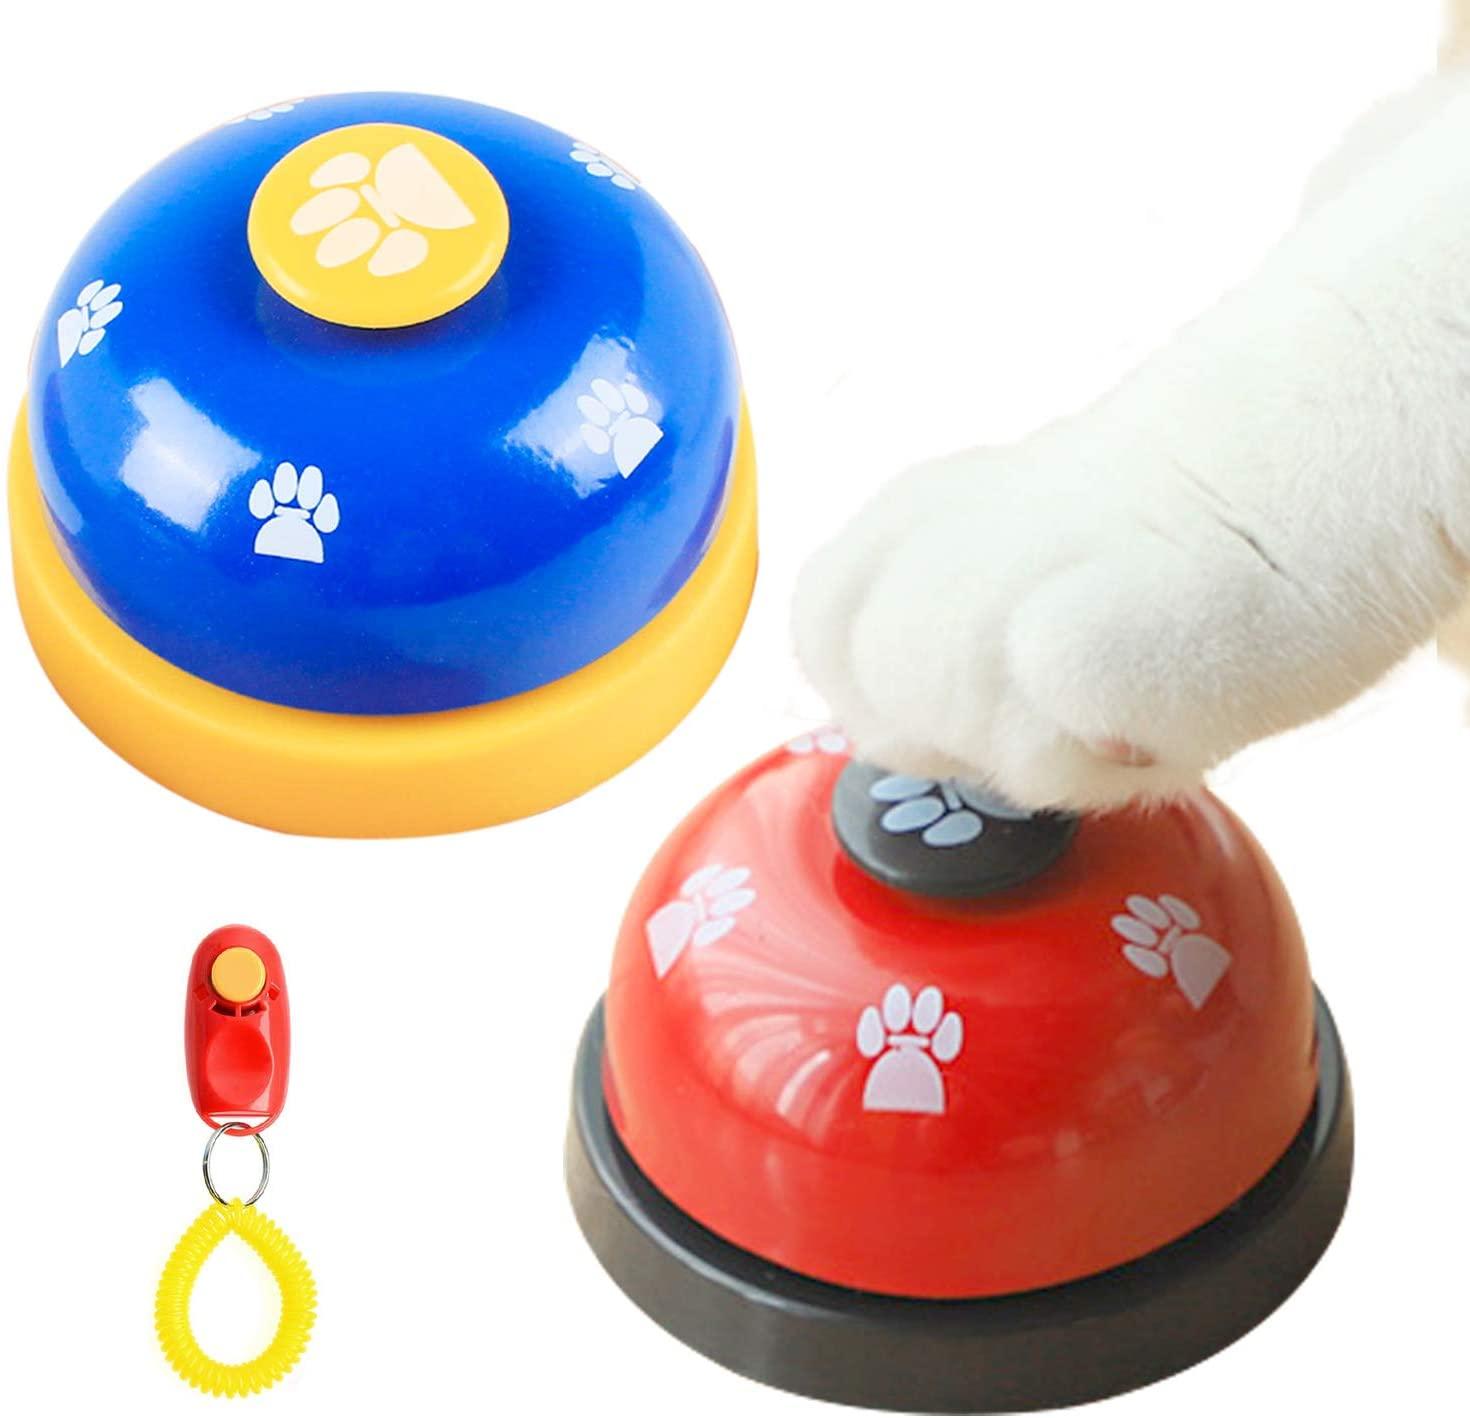 Lainrrew 2 Pcs Pet Training Bells, Metal Dog Potty Training Bells Door Bells with Non Slip Rubber Pad Bonus 1 Pcs Dog Training Clicker